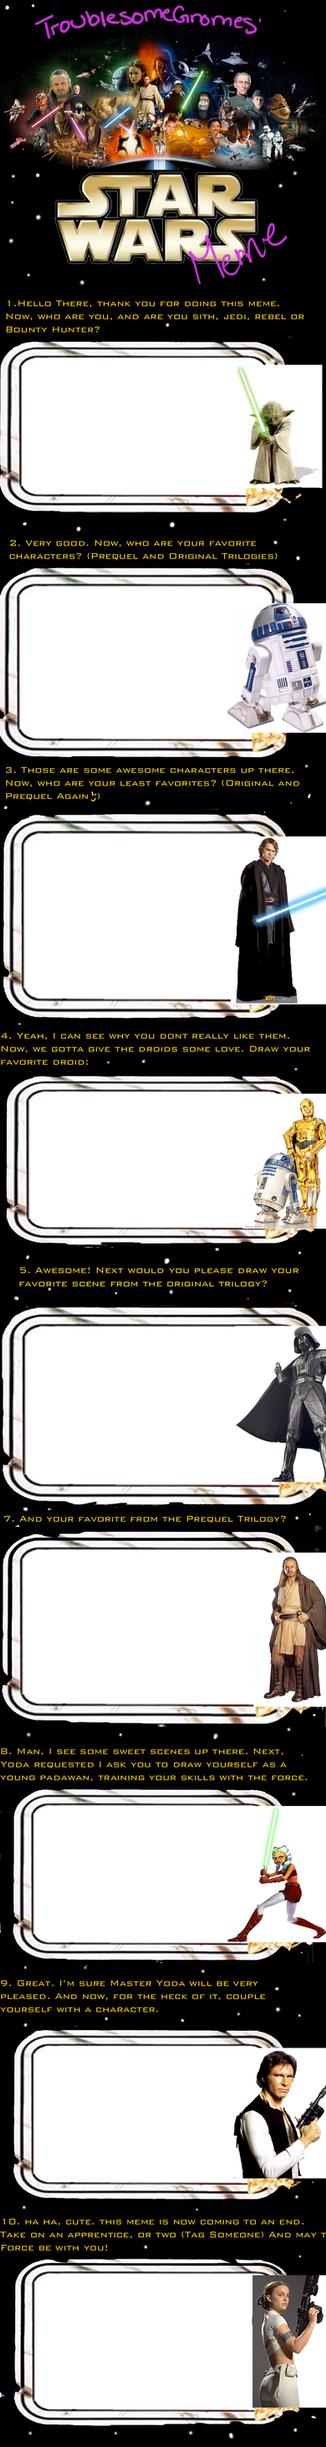 Blank Star Wars Meme by TroublesomeGnome